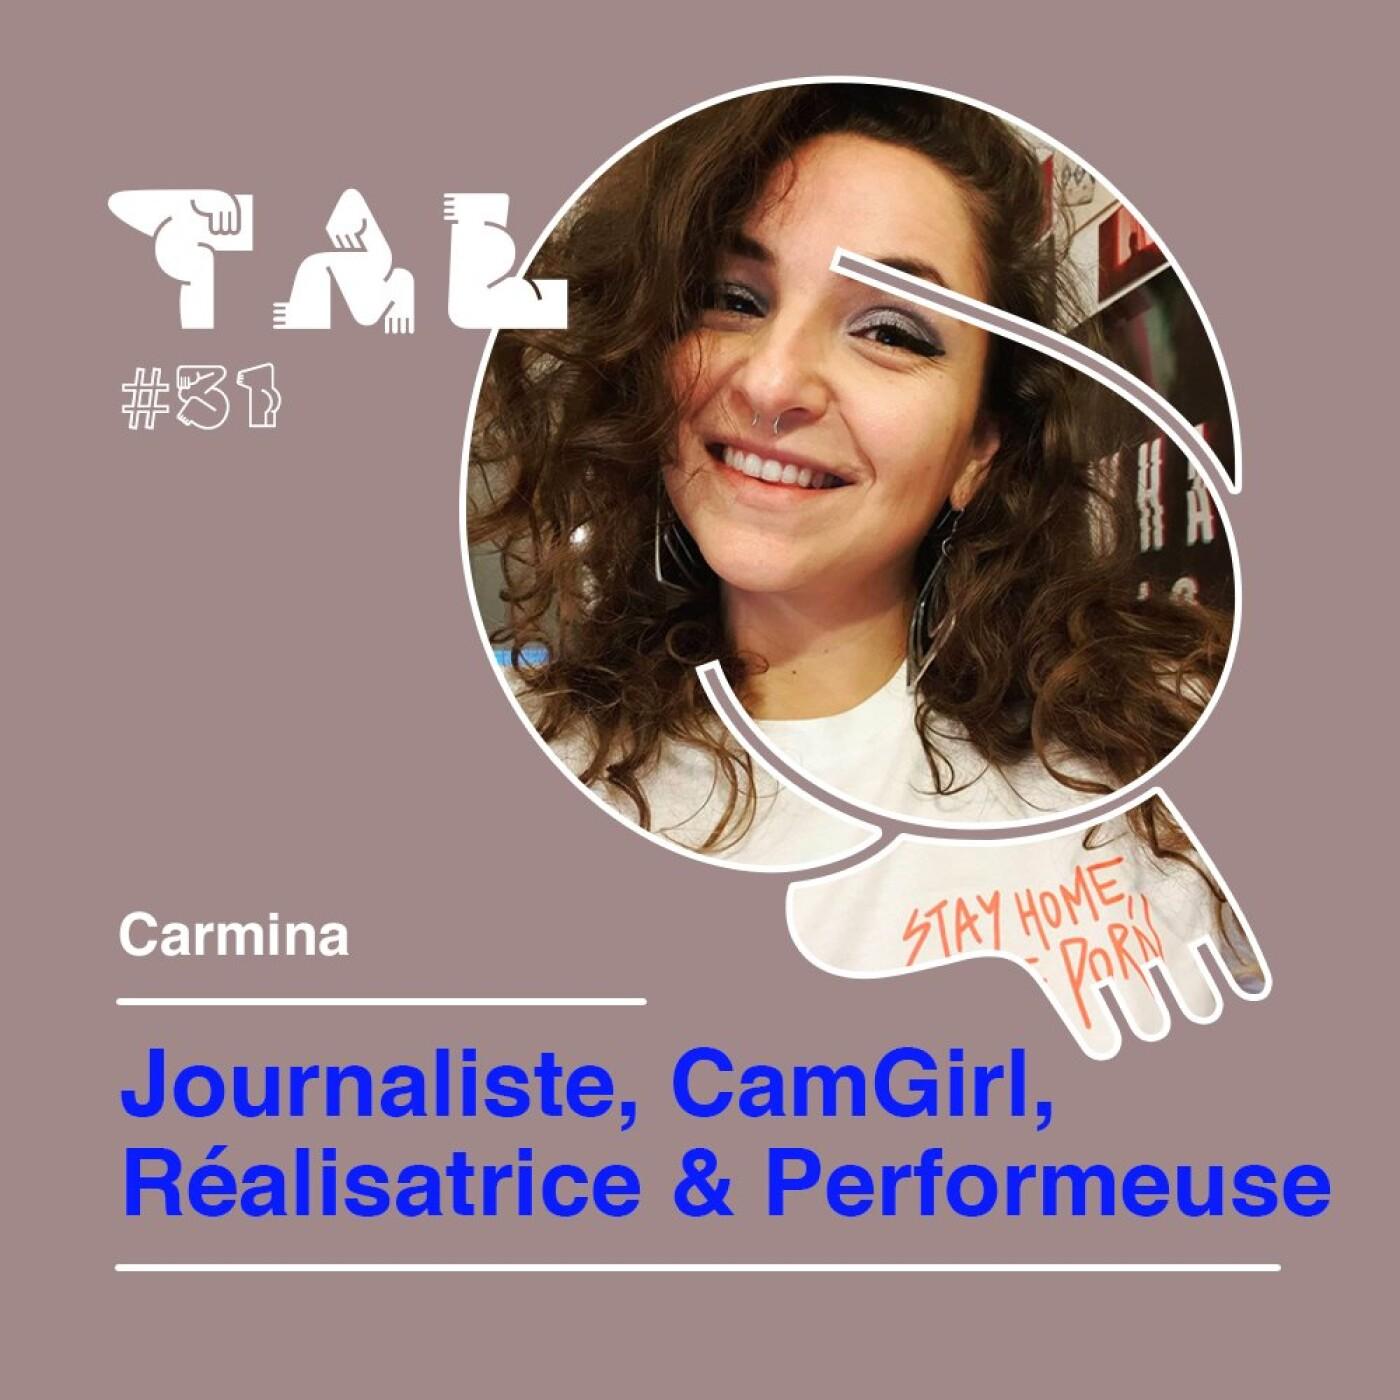 #31 - Carmina - Journaliste, CamGirl, Réalisatrice & Performeuse